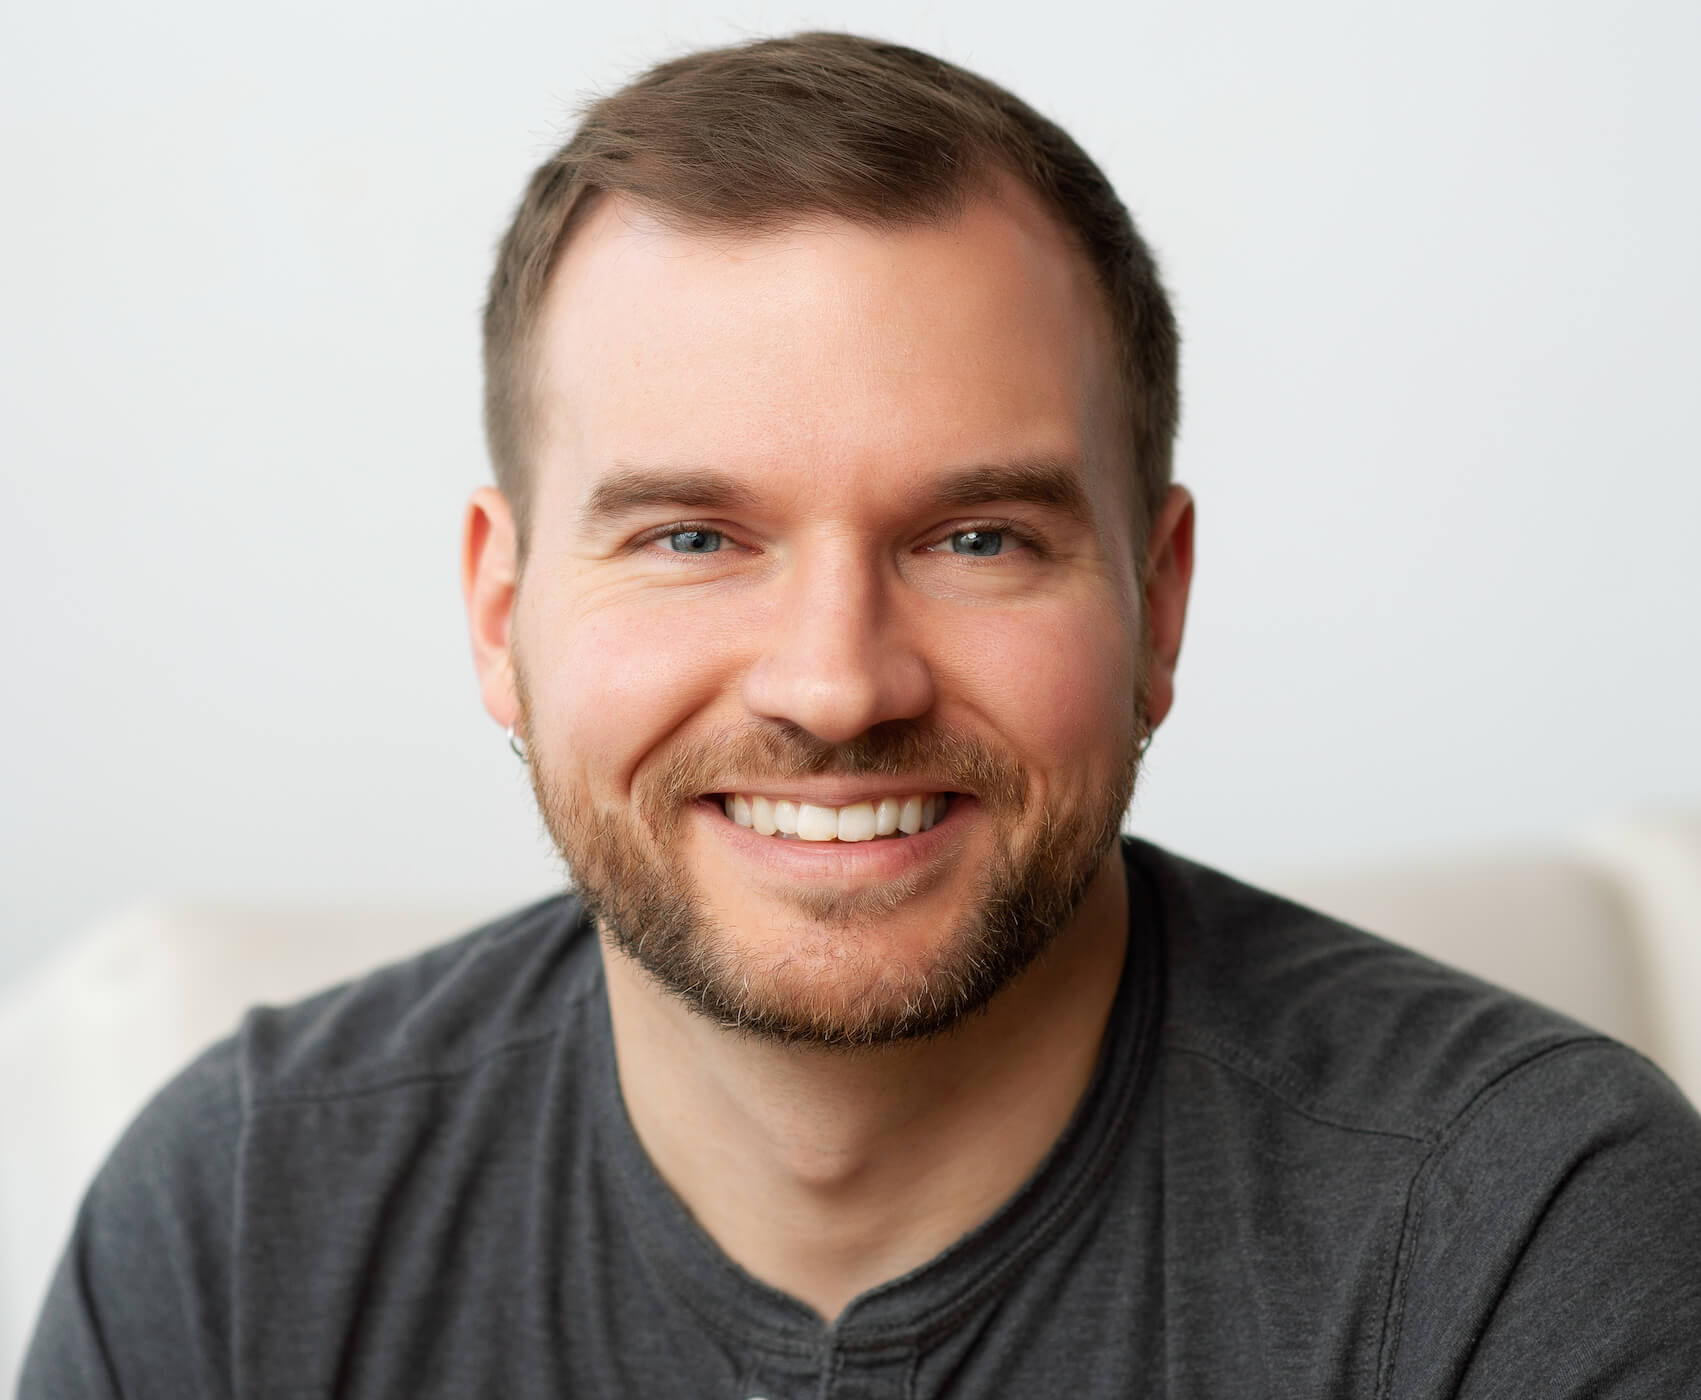 Brett Skrupski